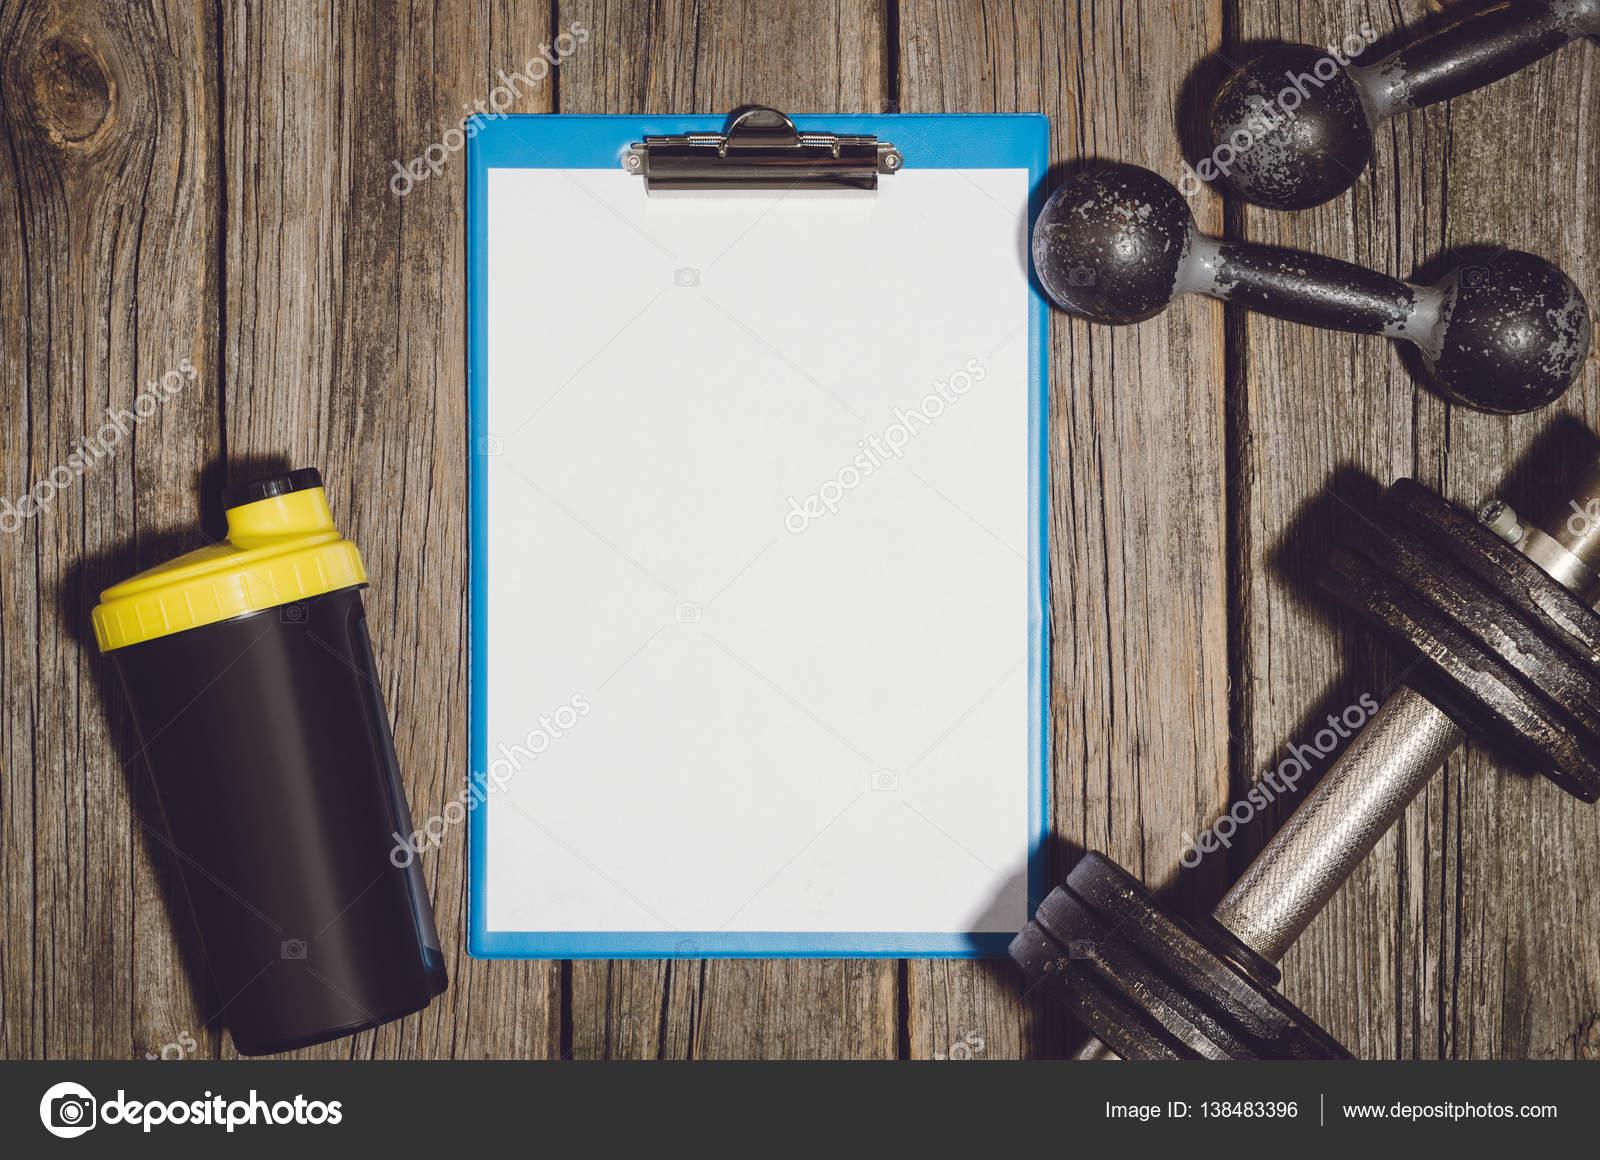 workout plan background dumbbells on wooden gym floor or